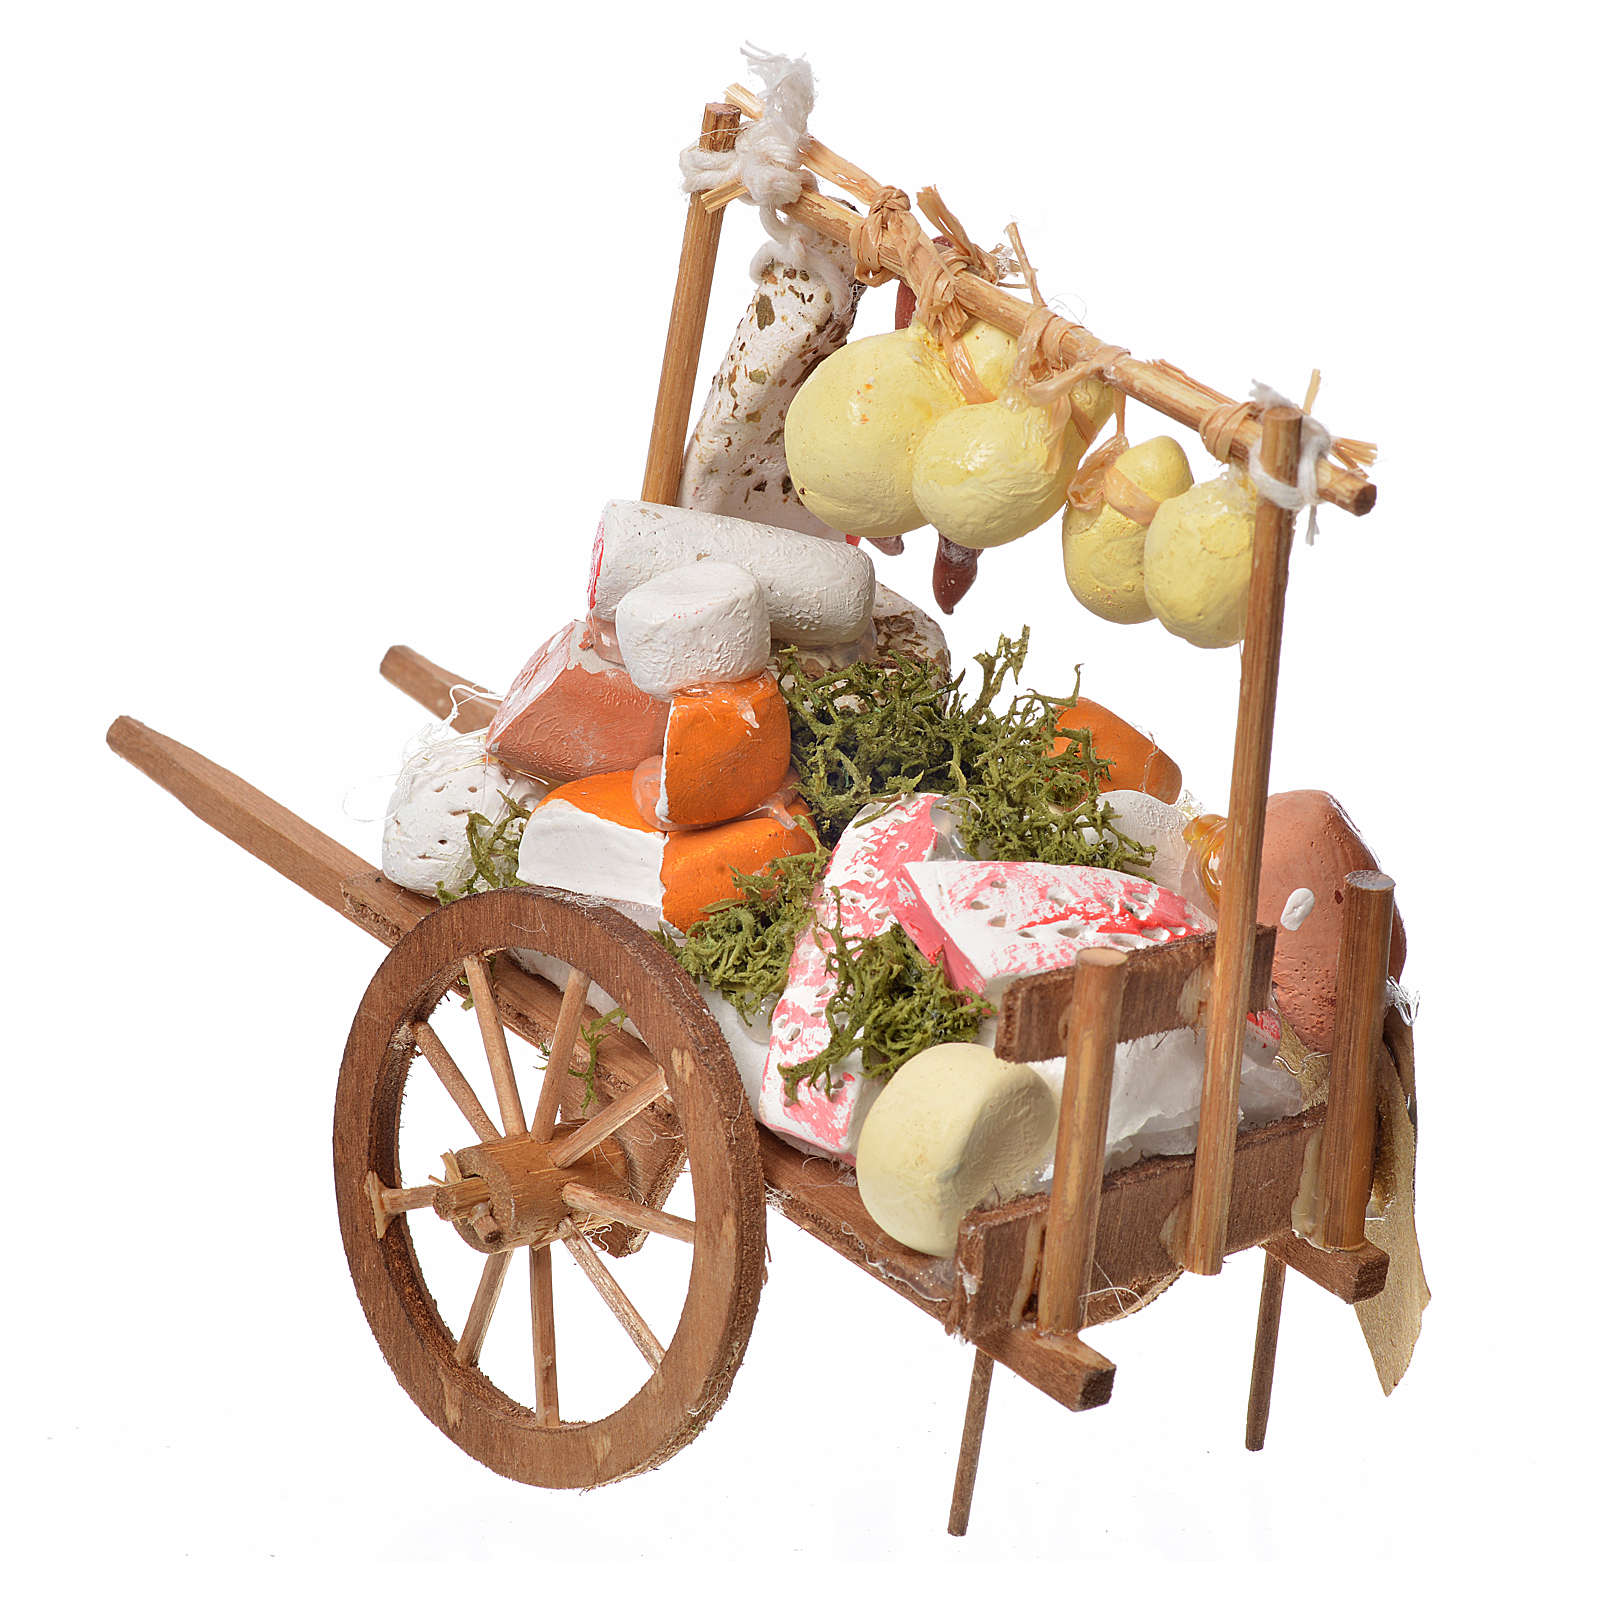 Carreta belén en madera con quesos en terracota 4